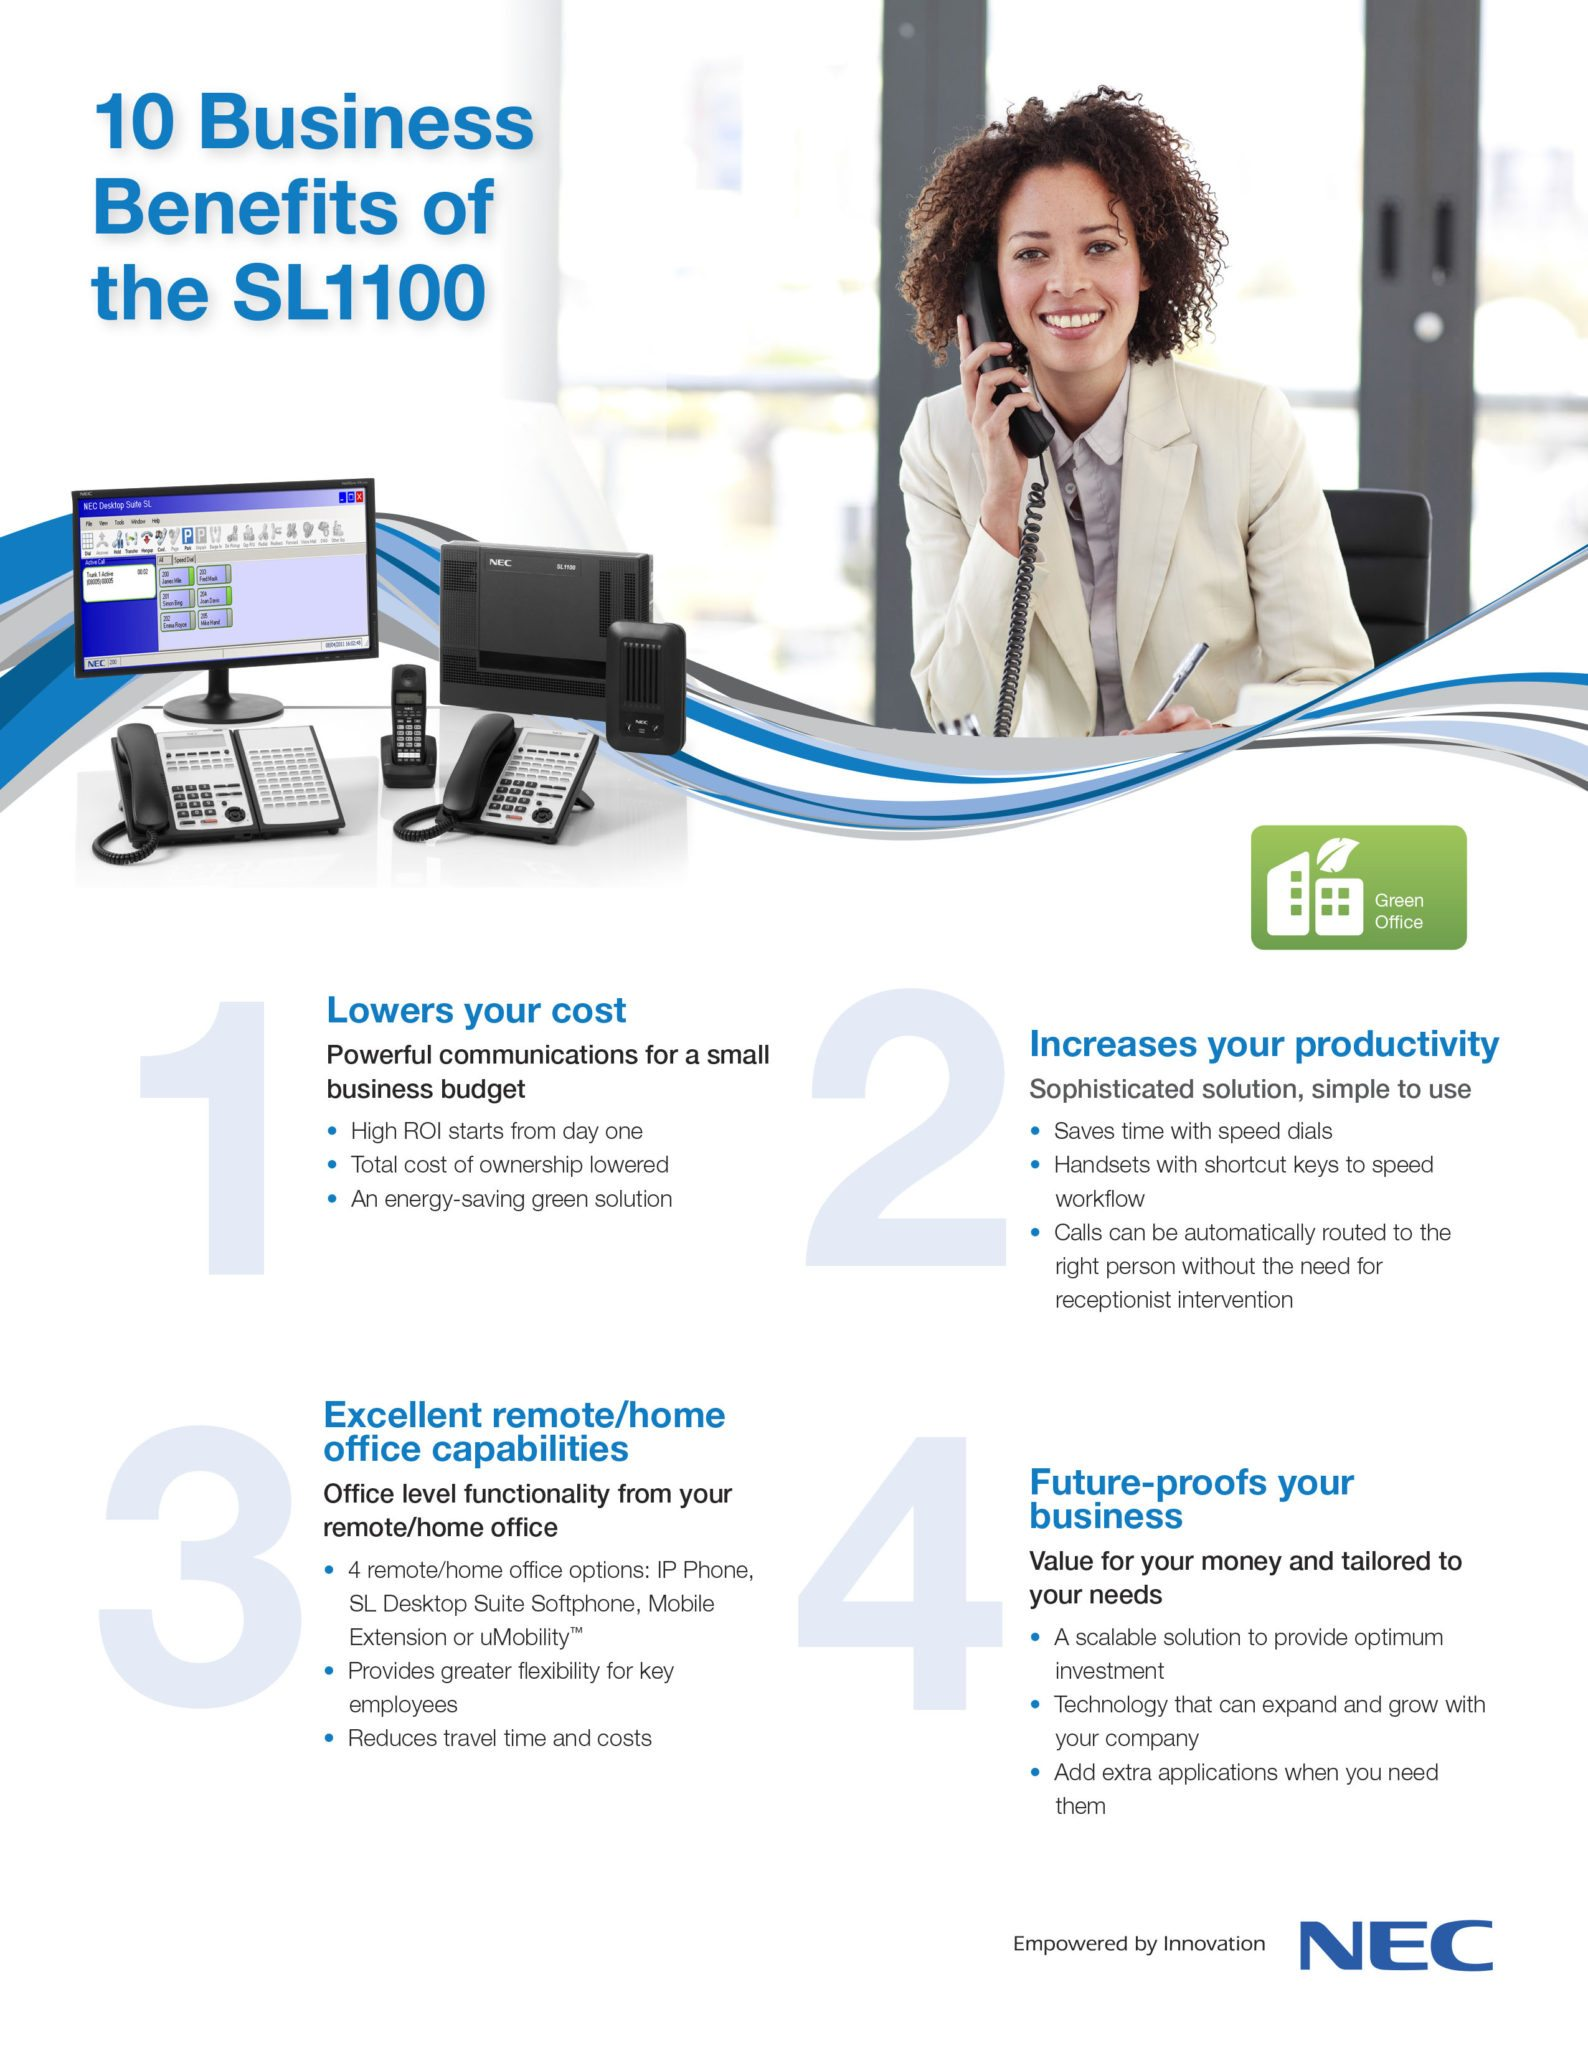 NEC_SL1100_Benefits-1